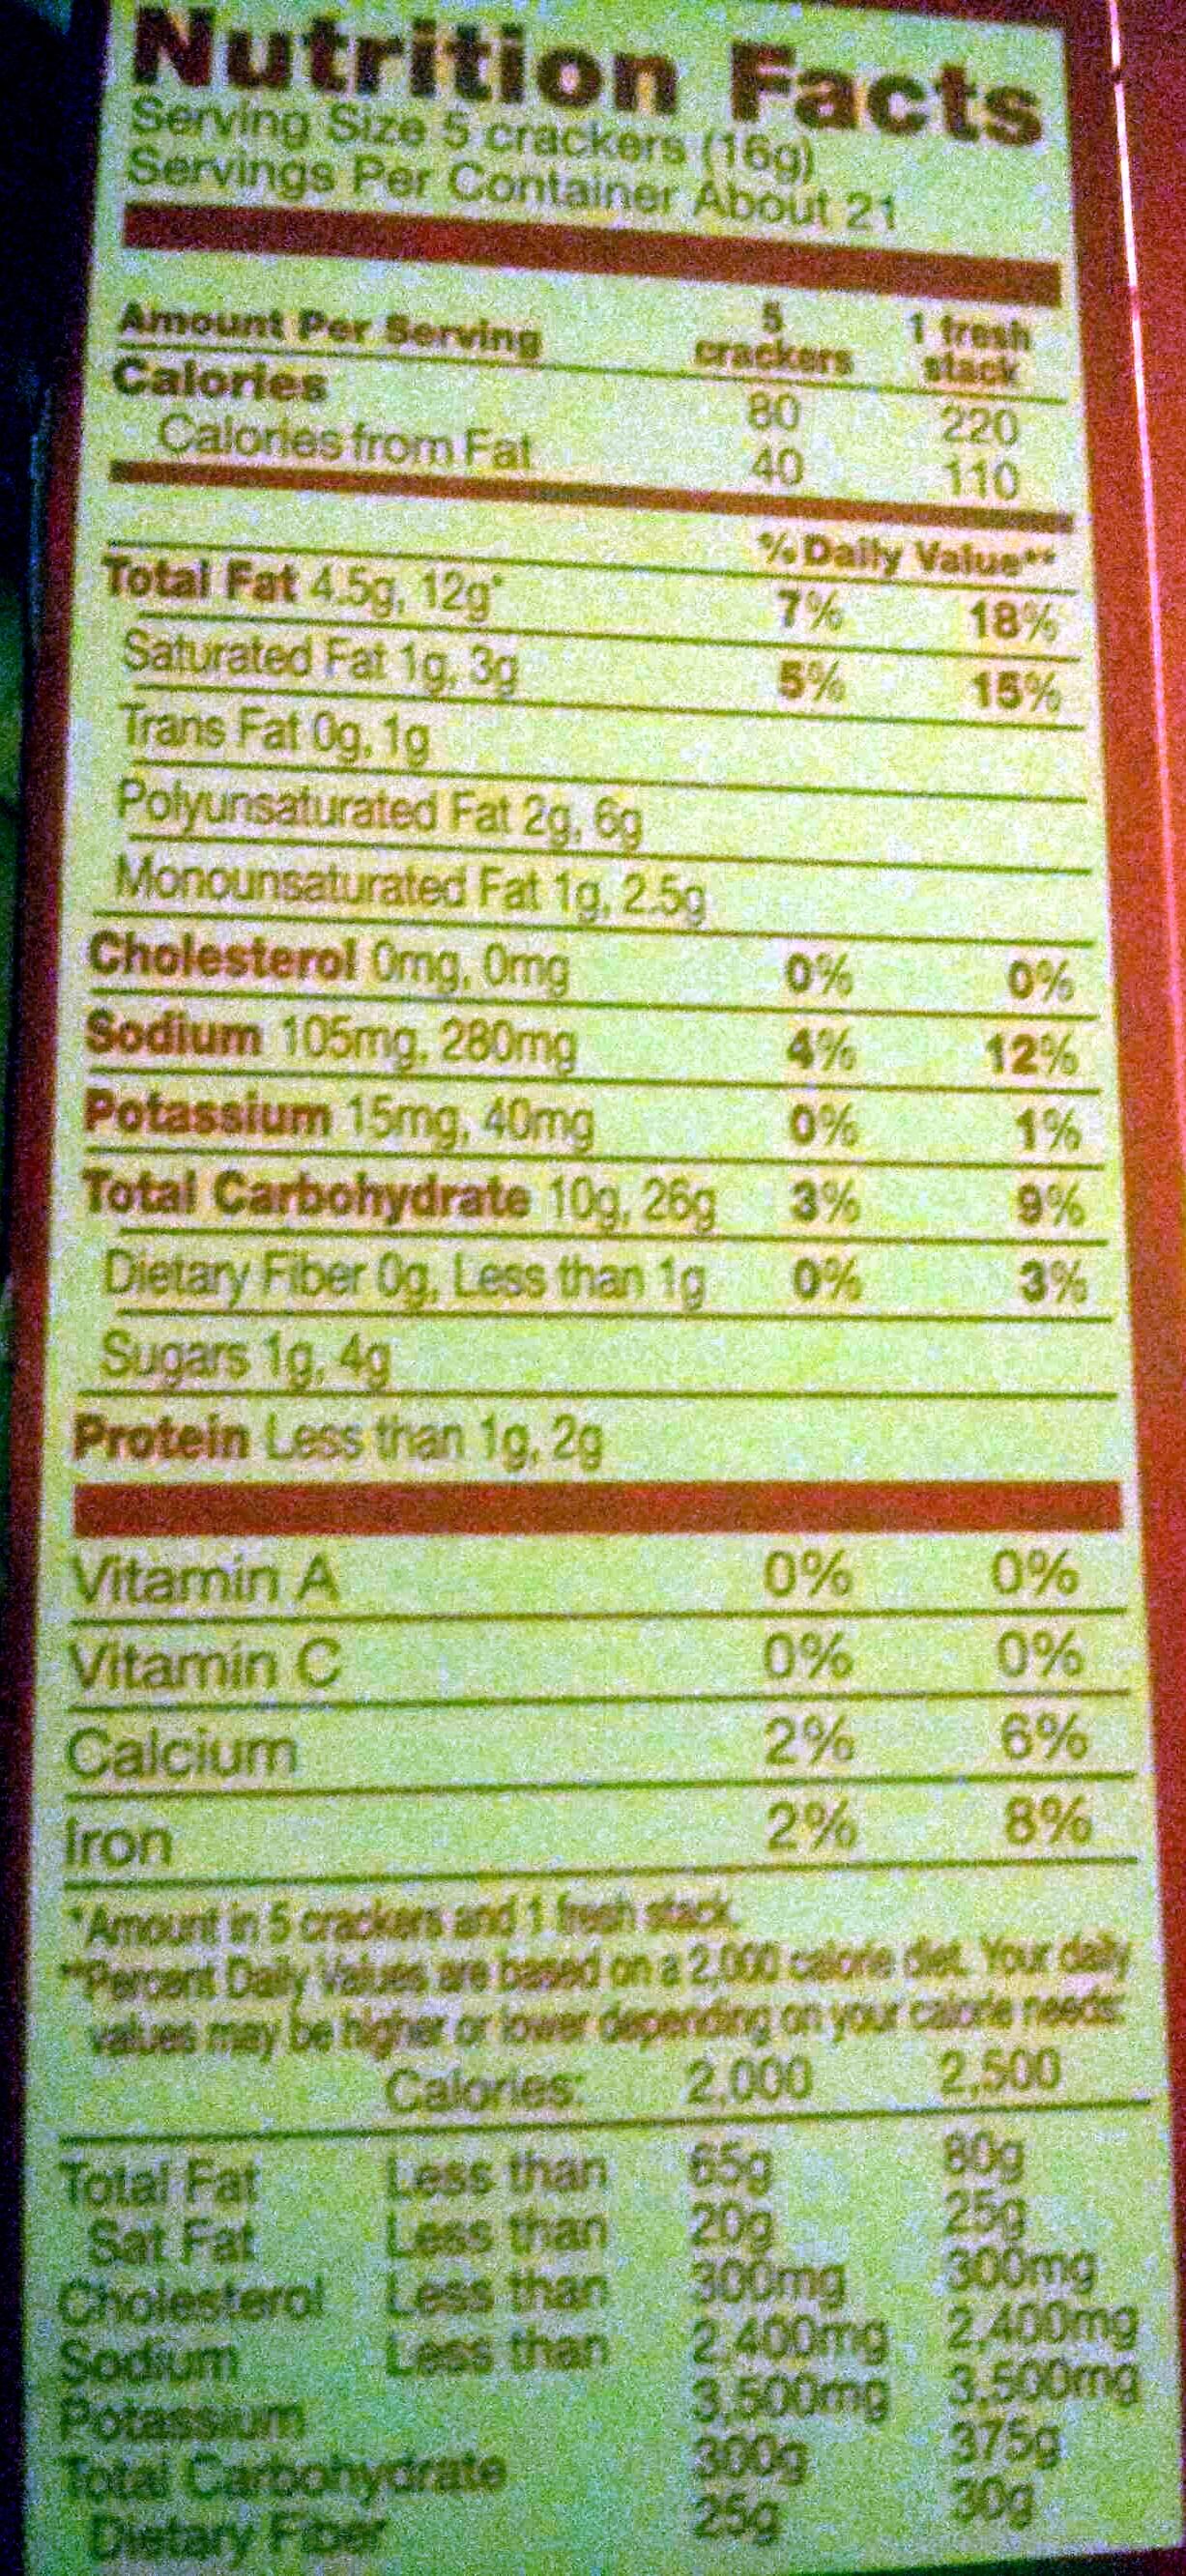 Nabisco ritz crackers fresh stacks 1x11.8 oz - Nutrition facts - en